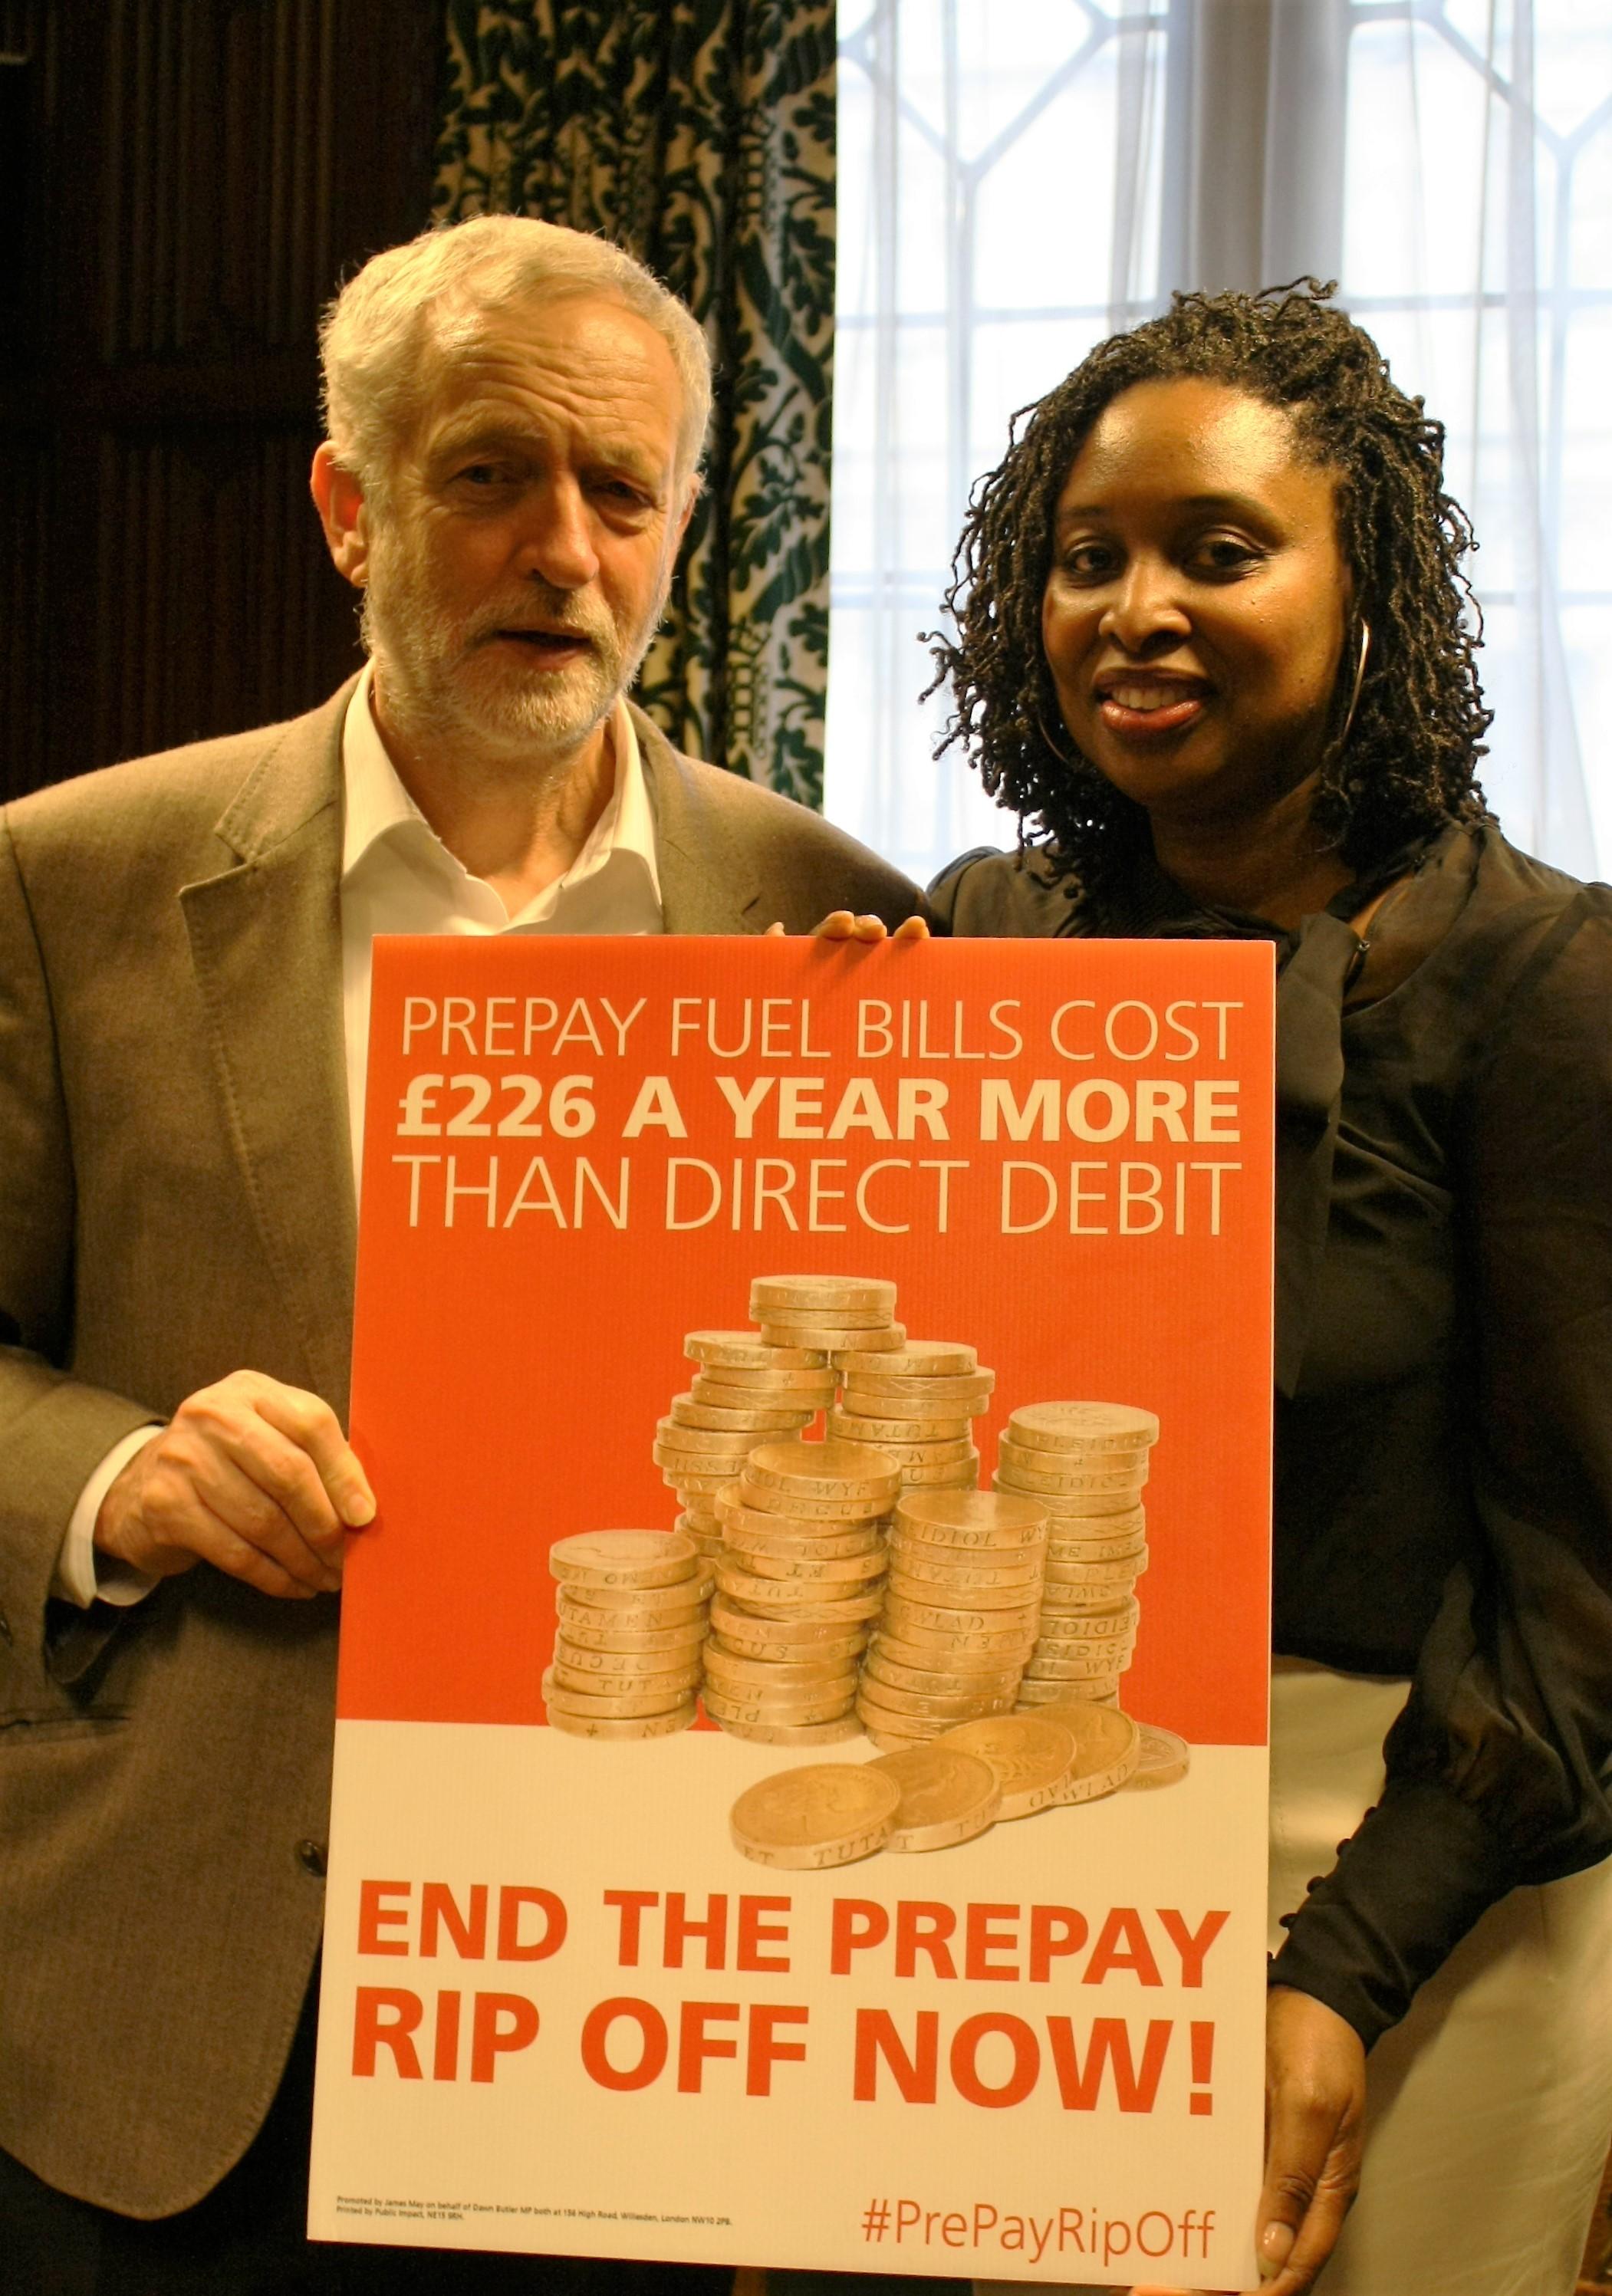 Jeremy_Corbyn_PrePayRipOff_Campaign.jpg